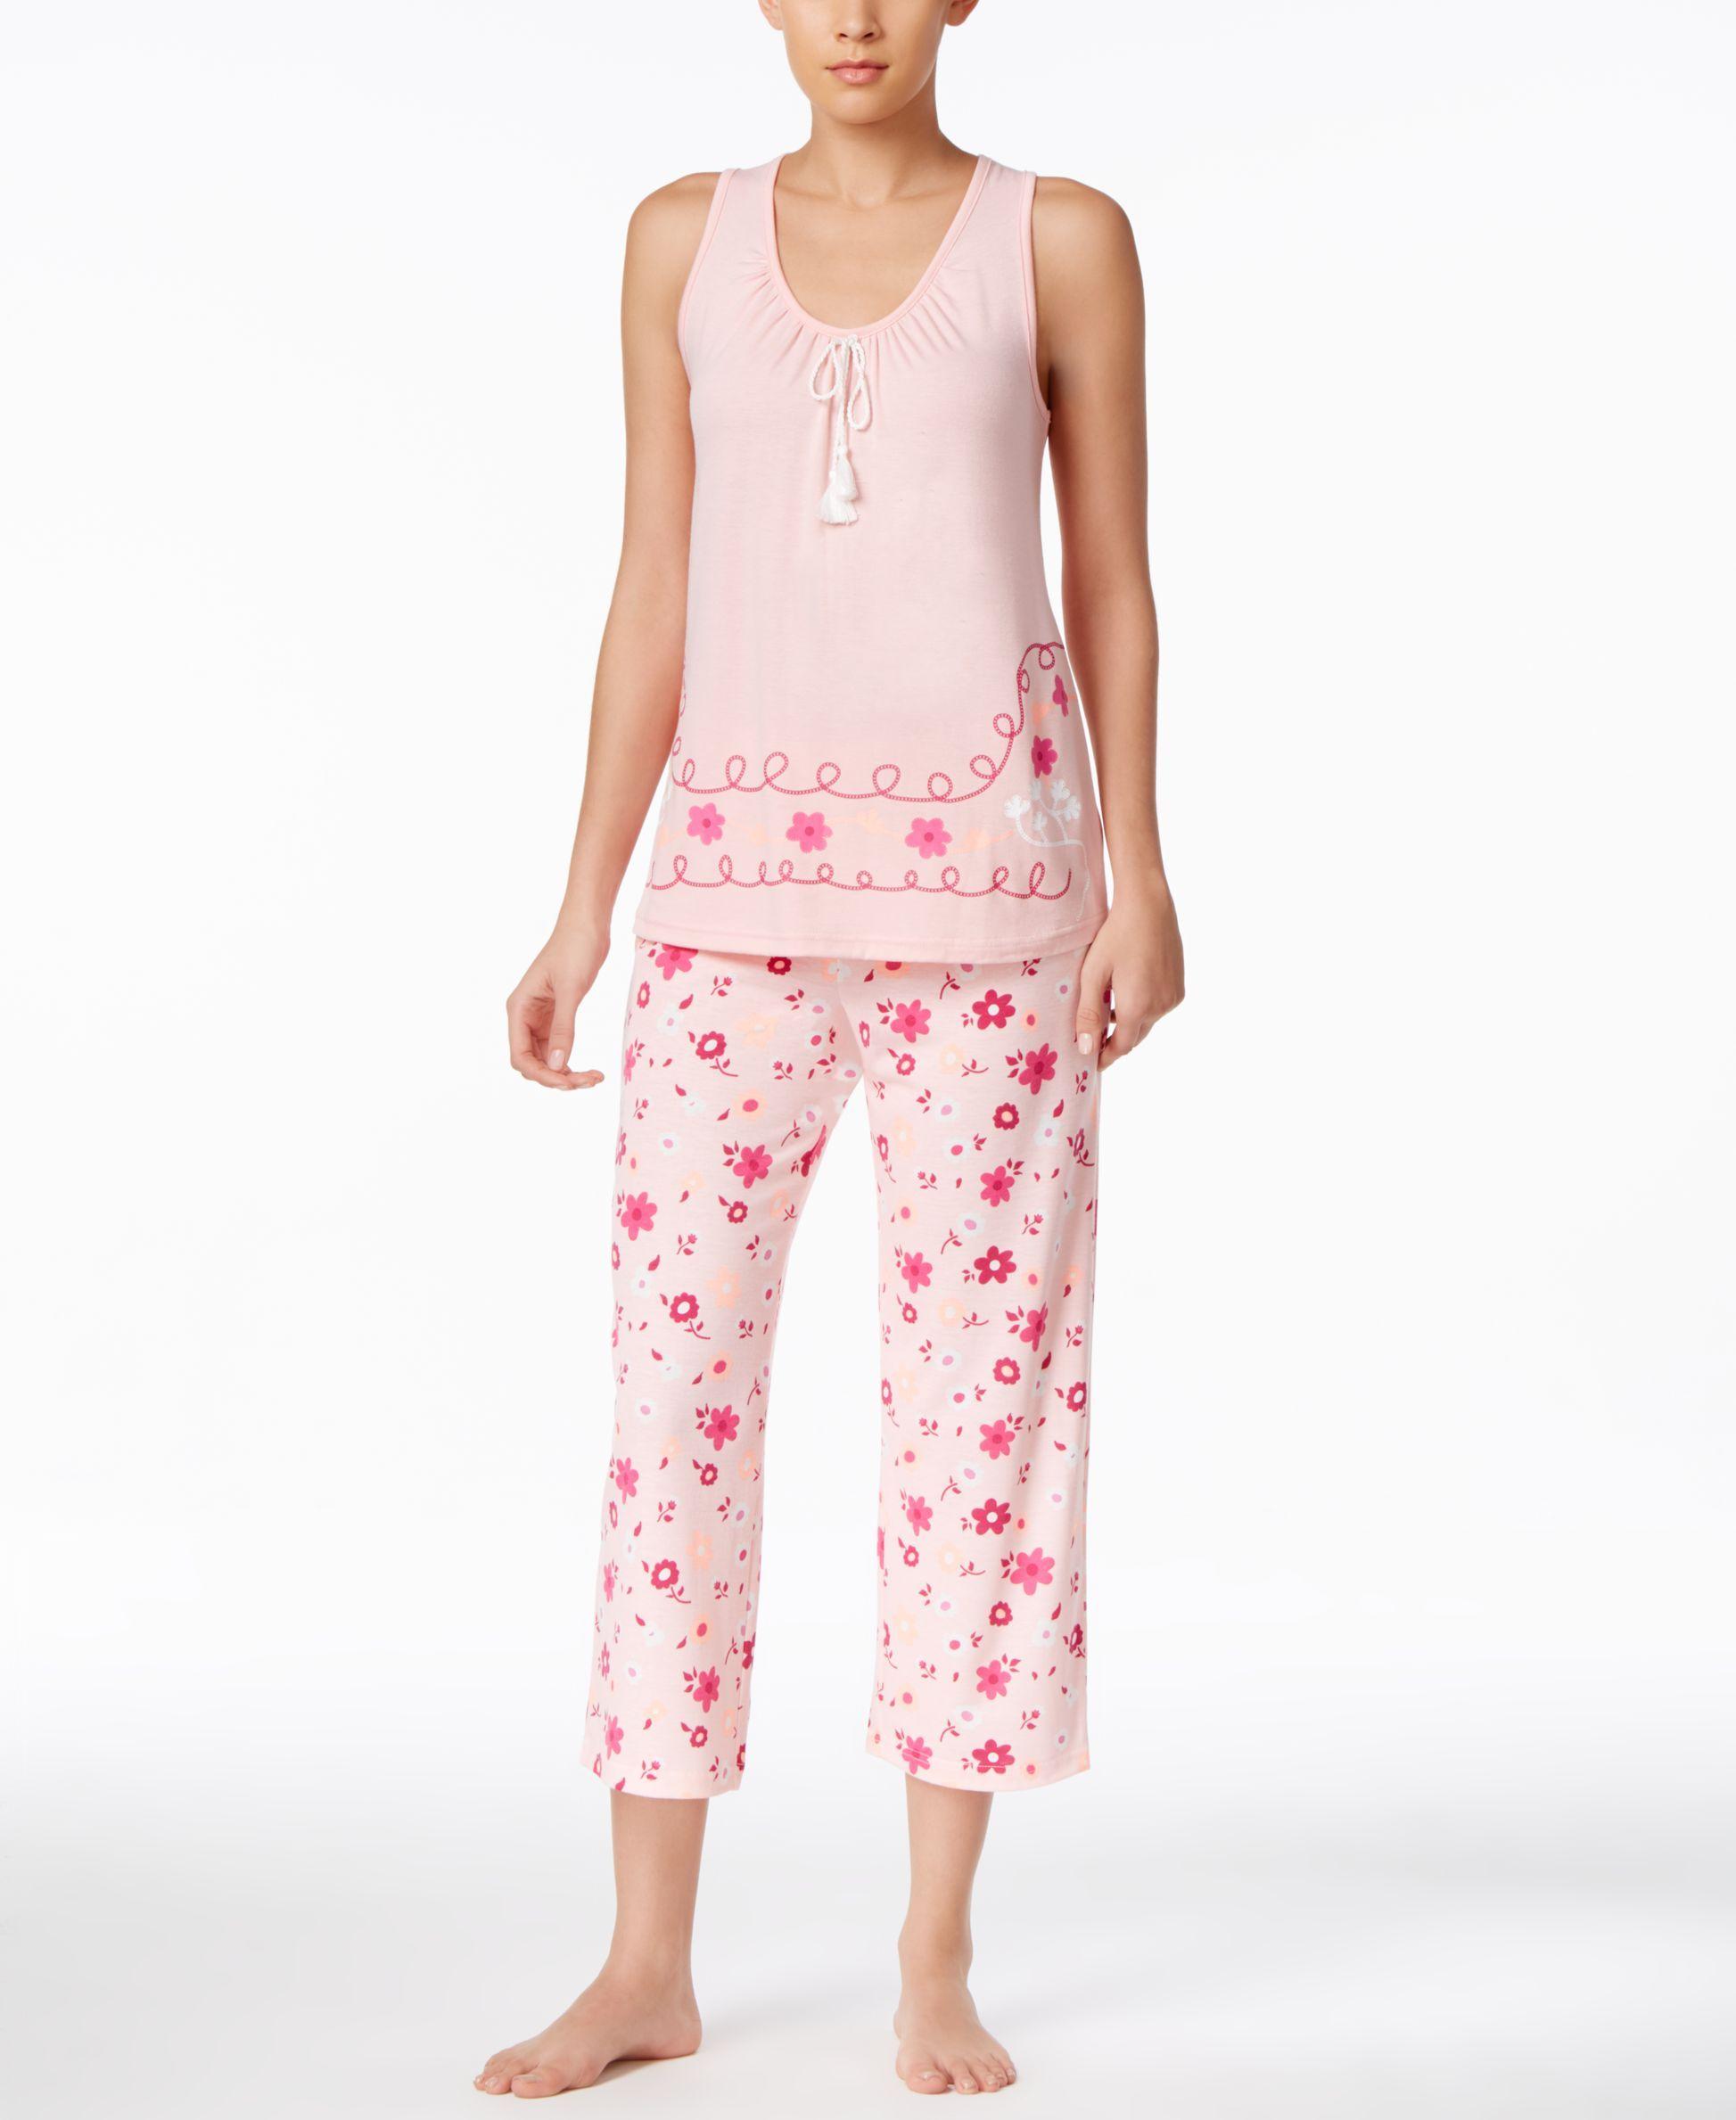 cfa3a8d42 Pj Couture Floral-Print Sleeveless Top and Capri Pants Pajama Set ...